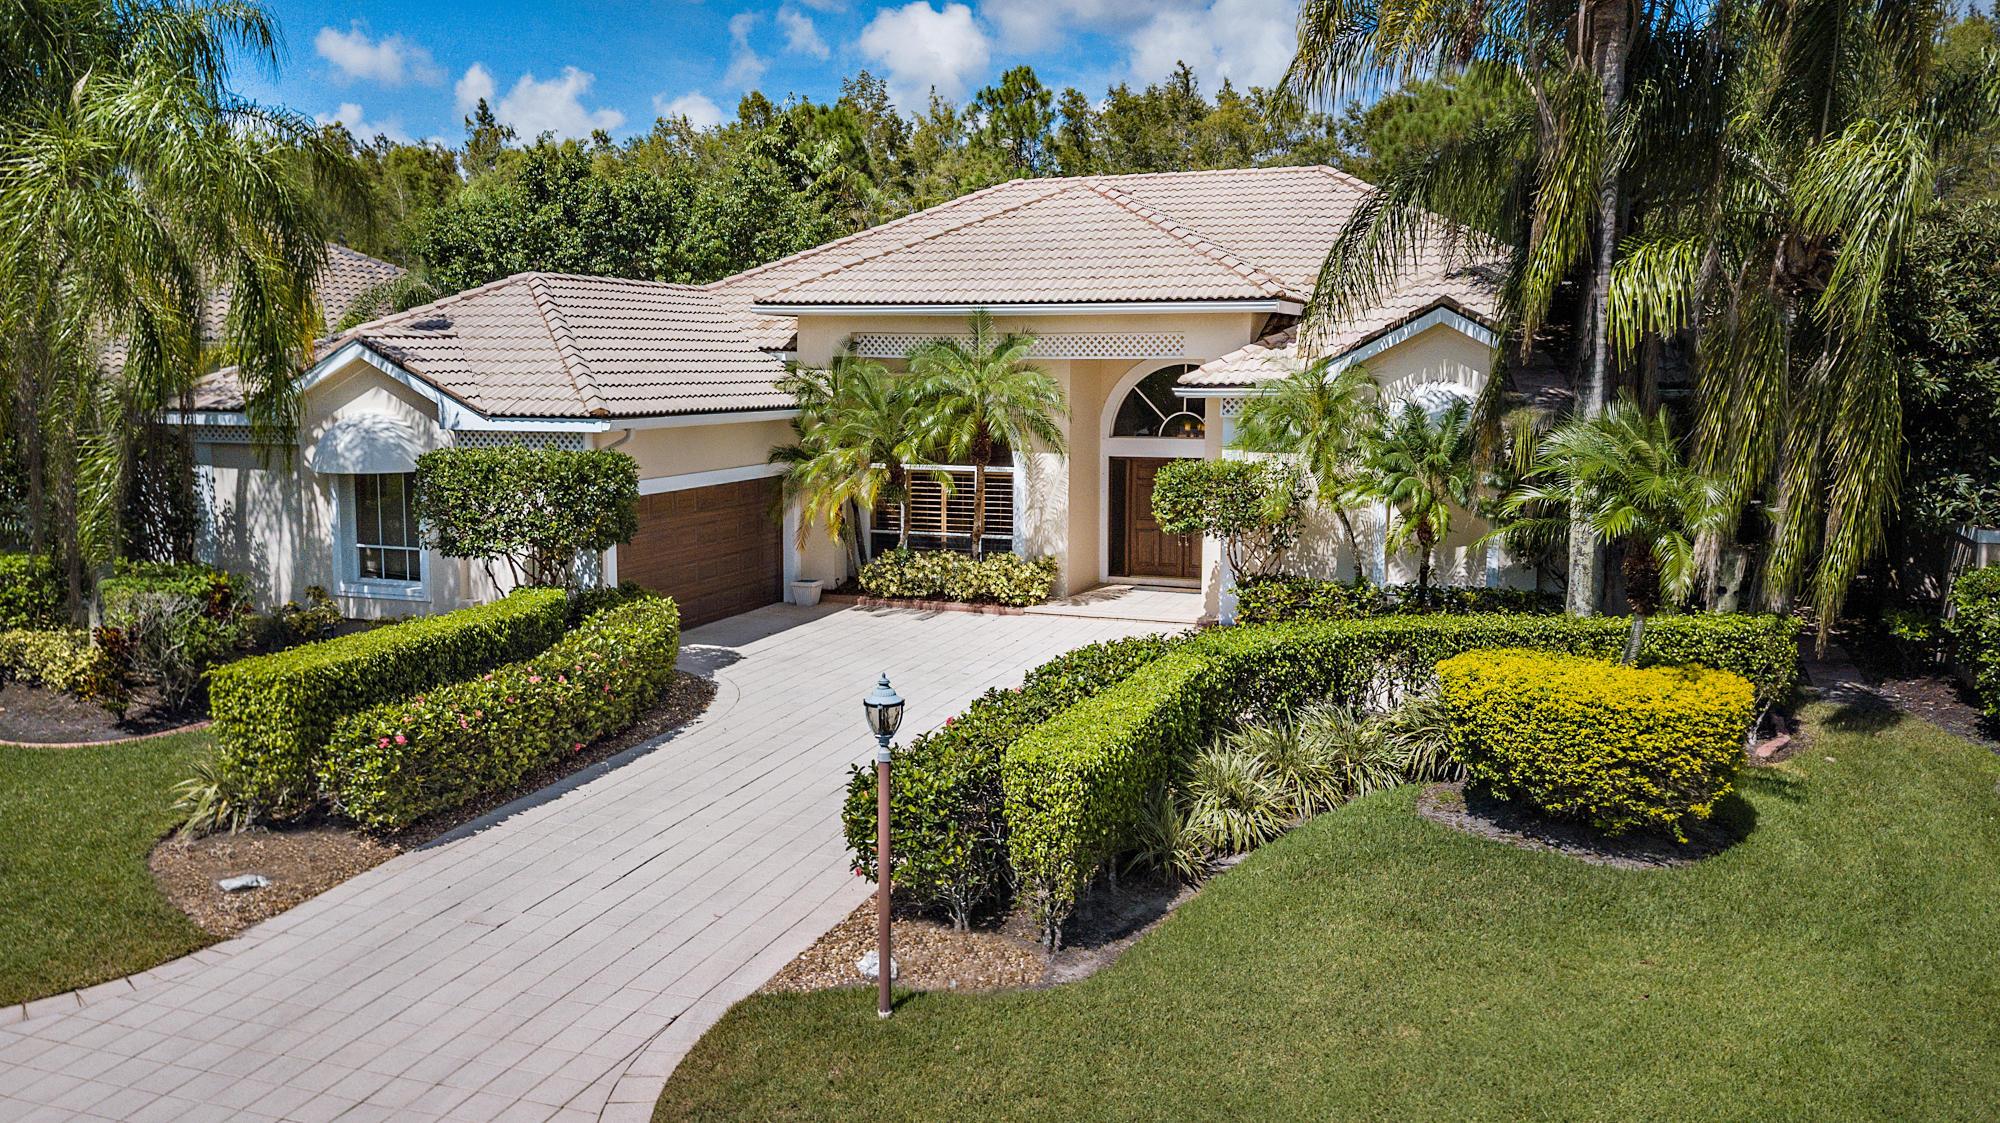 Details for 14 Windward Isle, Palm Beach Gardens, FL 33418